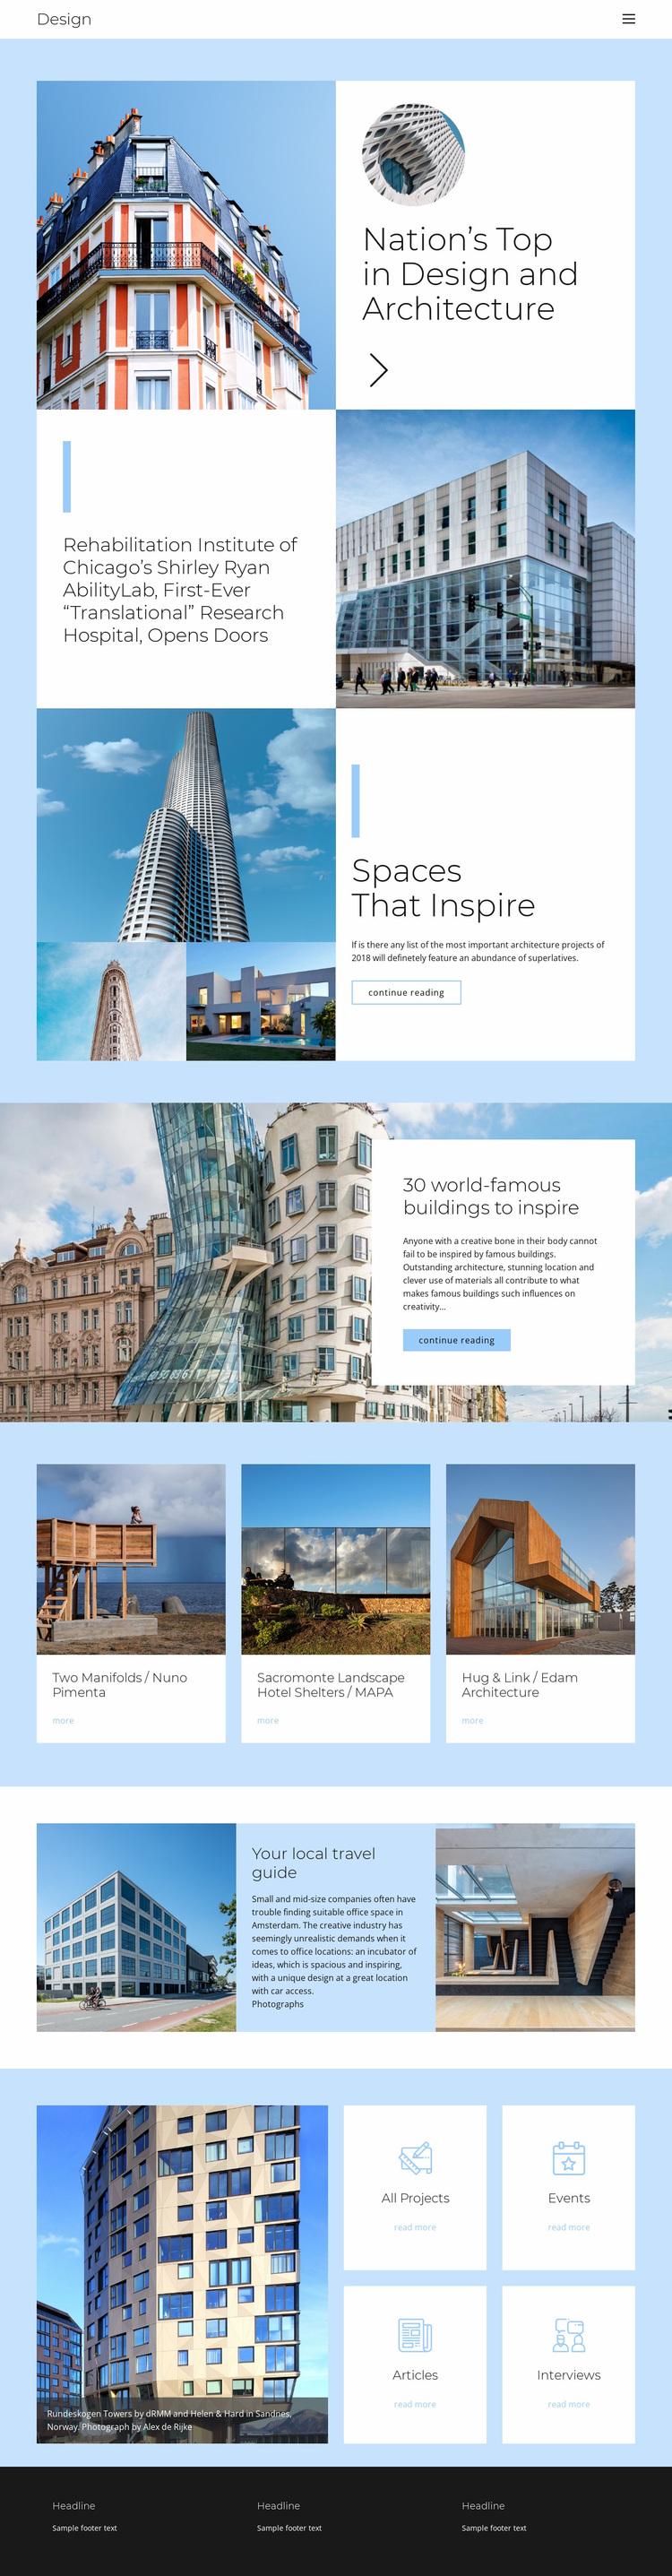 Architecture city guide Website Design